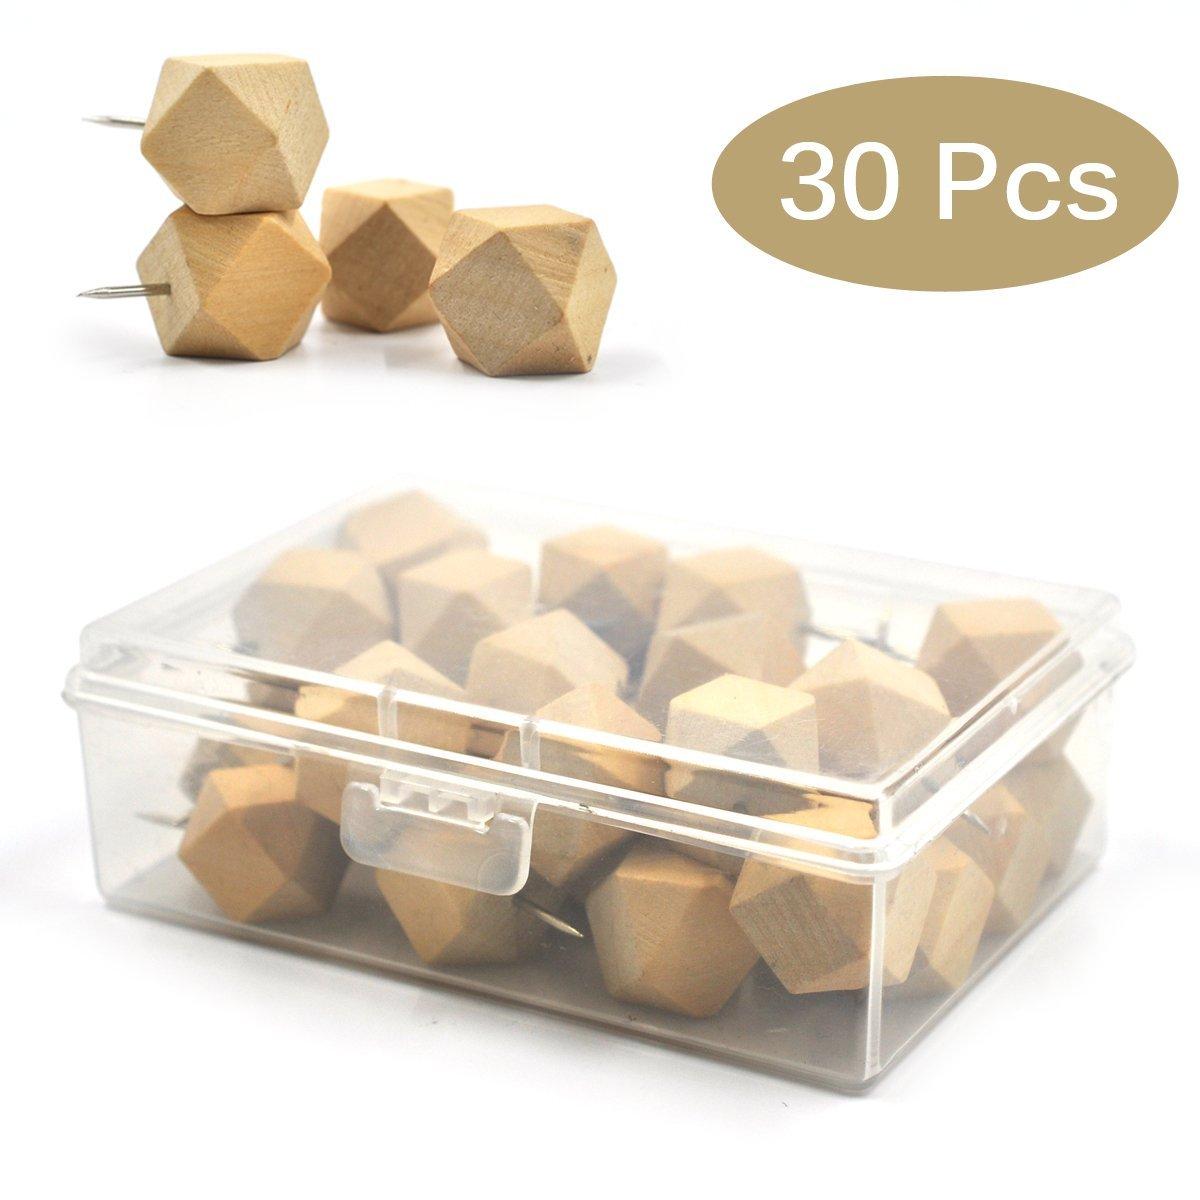 eZAKKA Geometric Wooden Push Pins Thumb Tacks Decorative for Cork Boards Map Photos Calendar with Box, 30-Pack